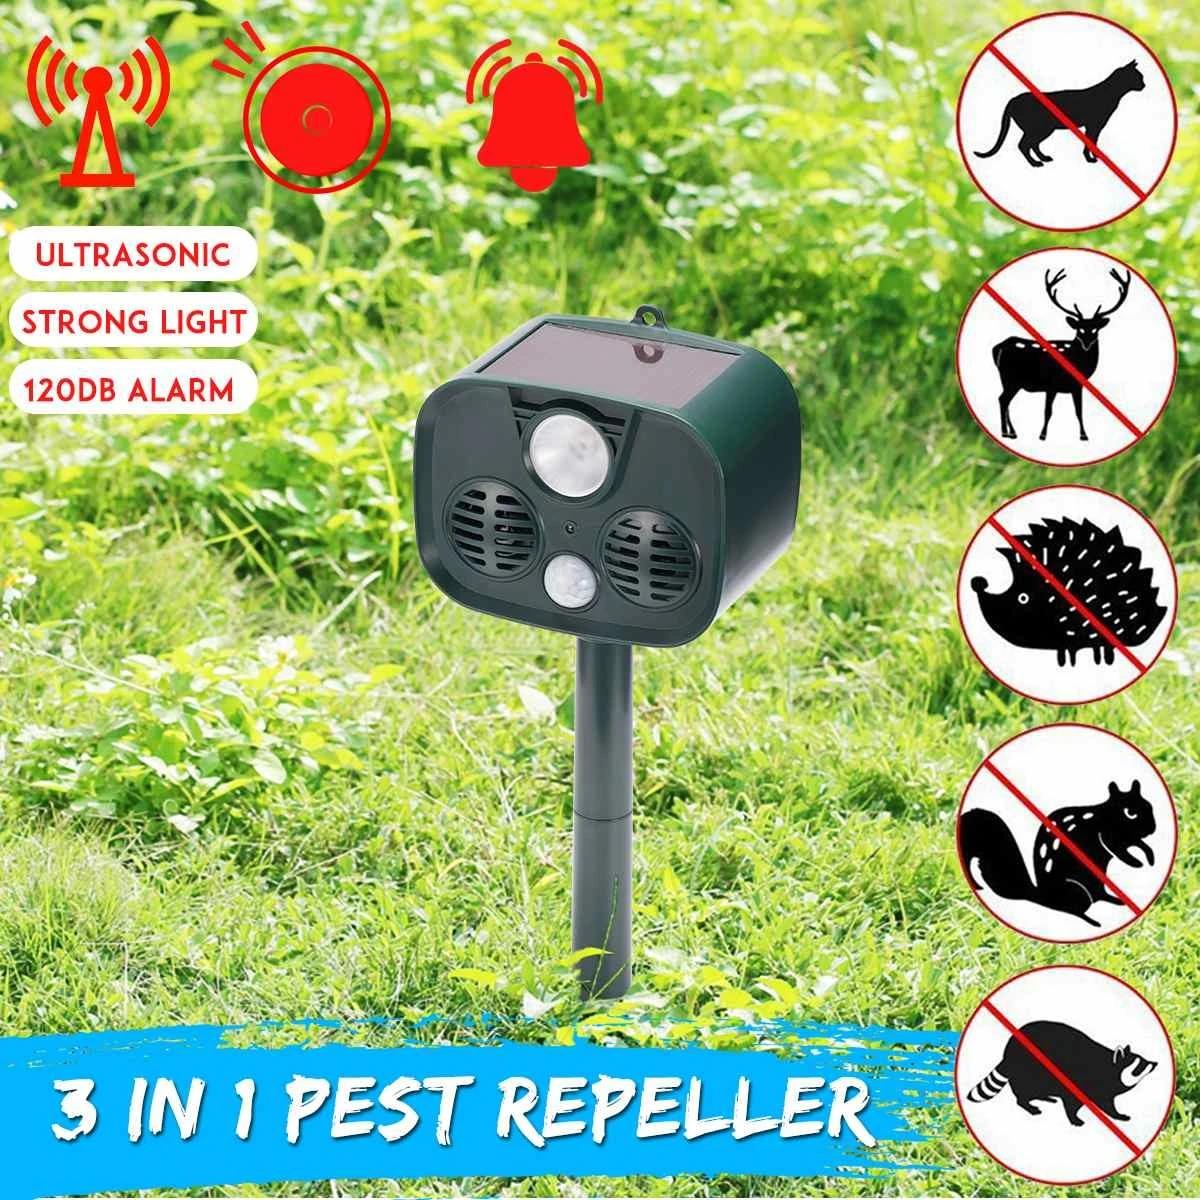 2018new solar ultrasonic bird repeller for garden led flash mole ultrasound dog control f ox rodent rats pest animal 120db alert